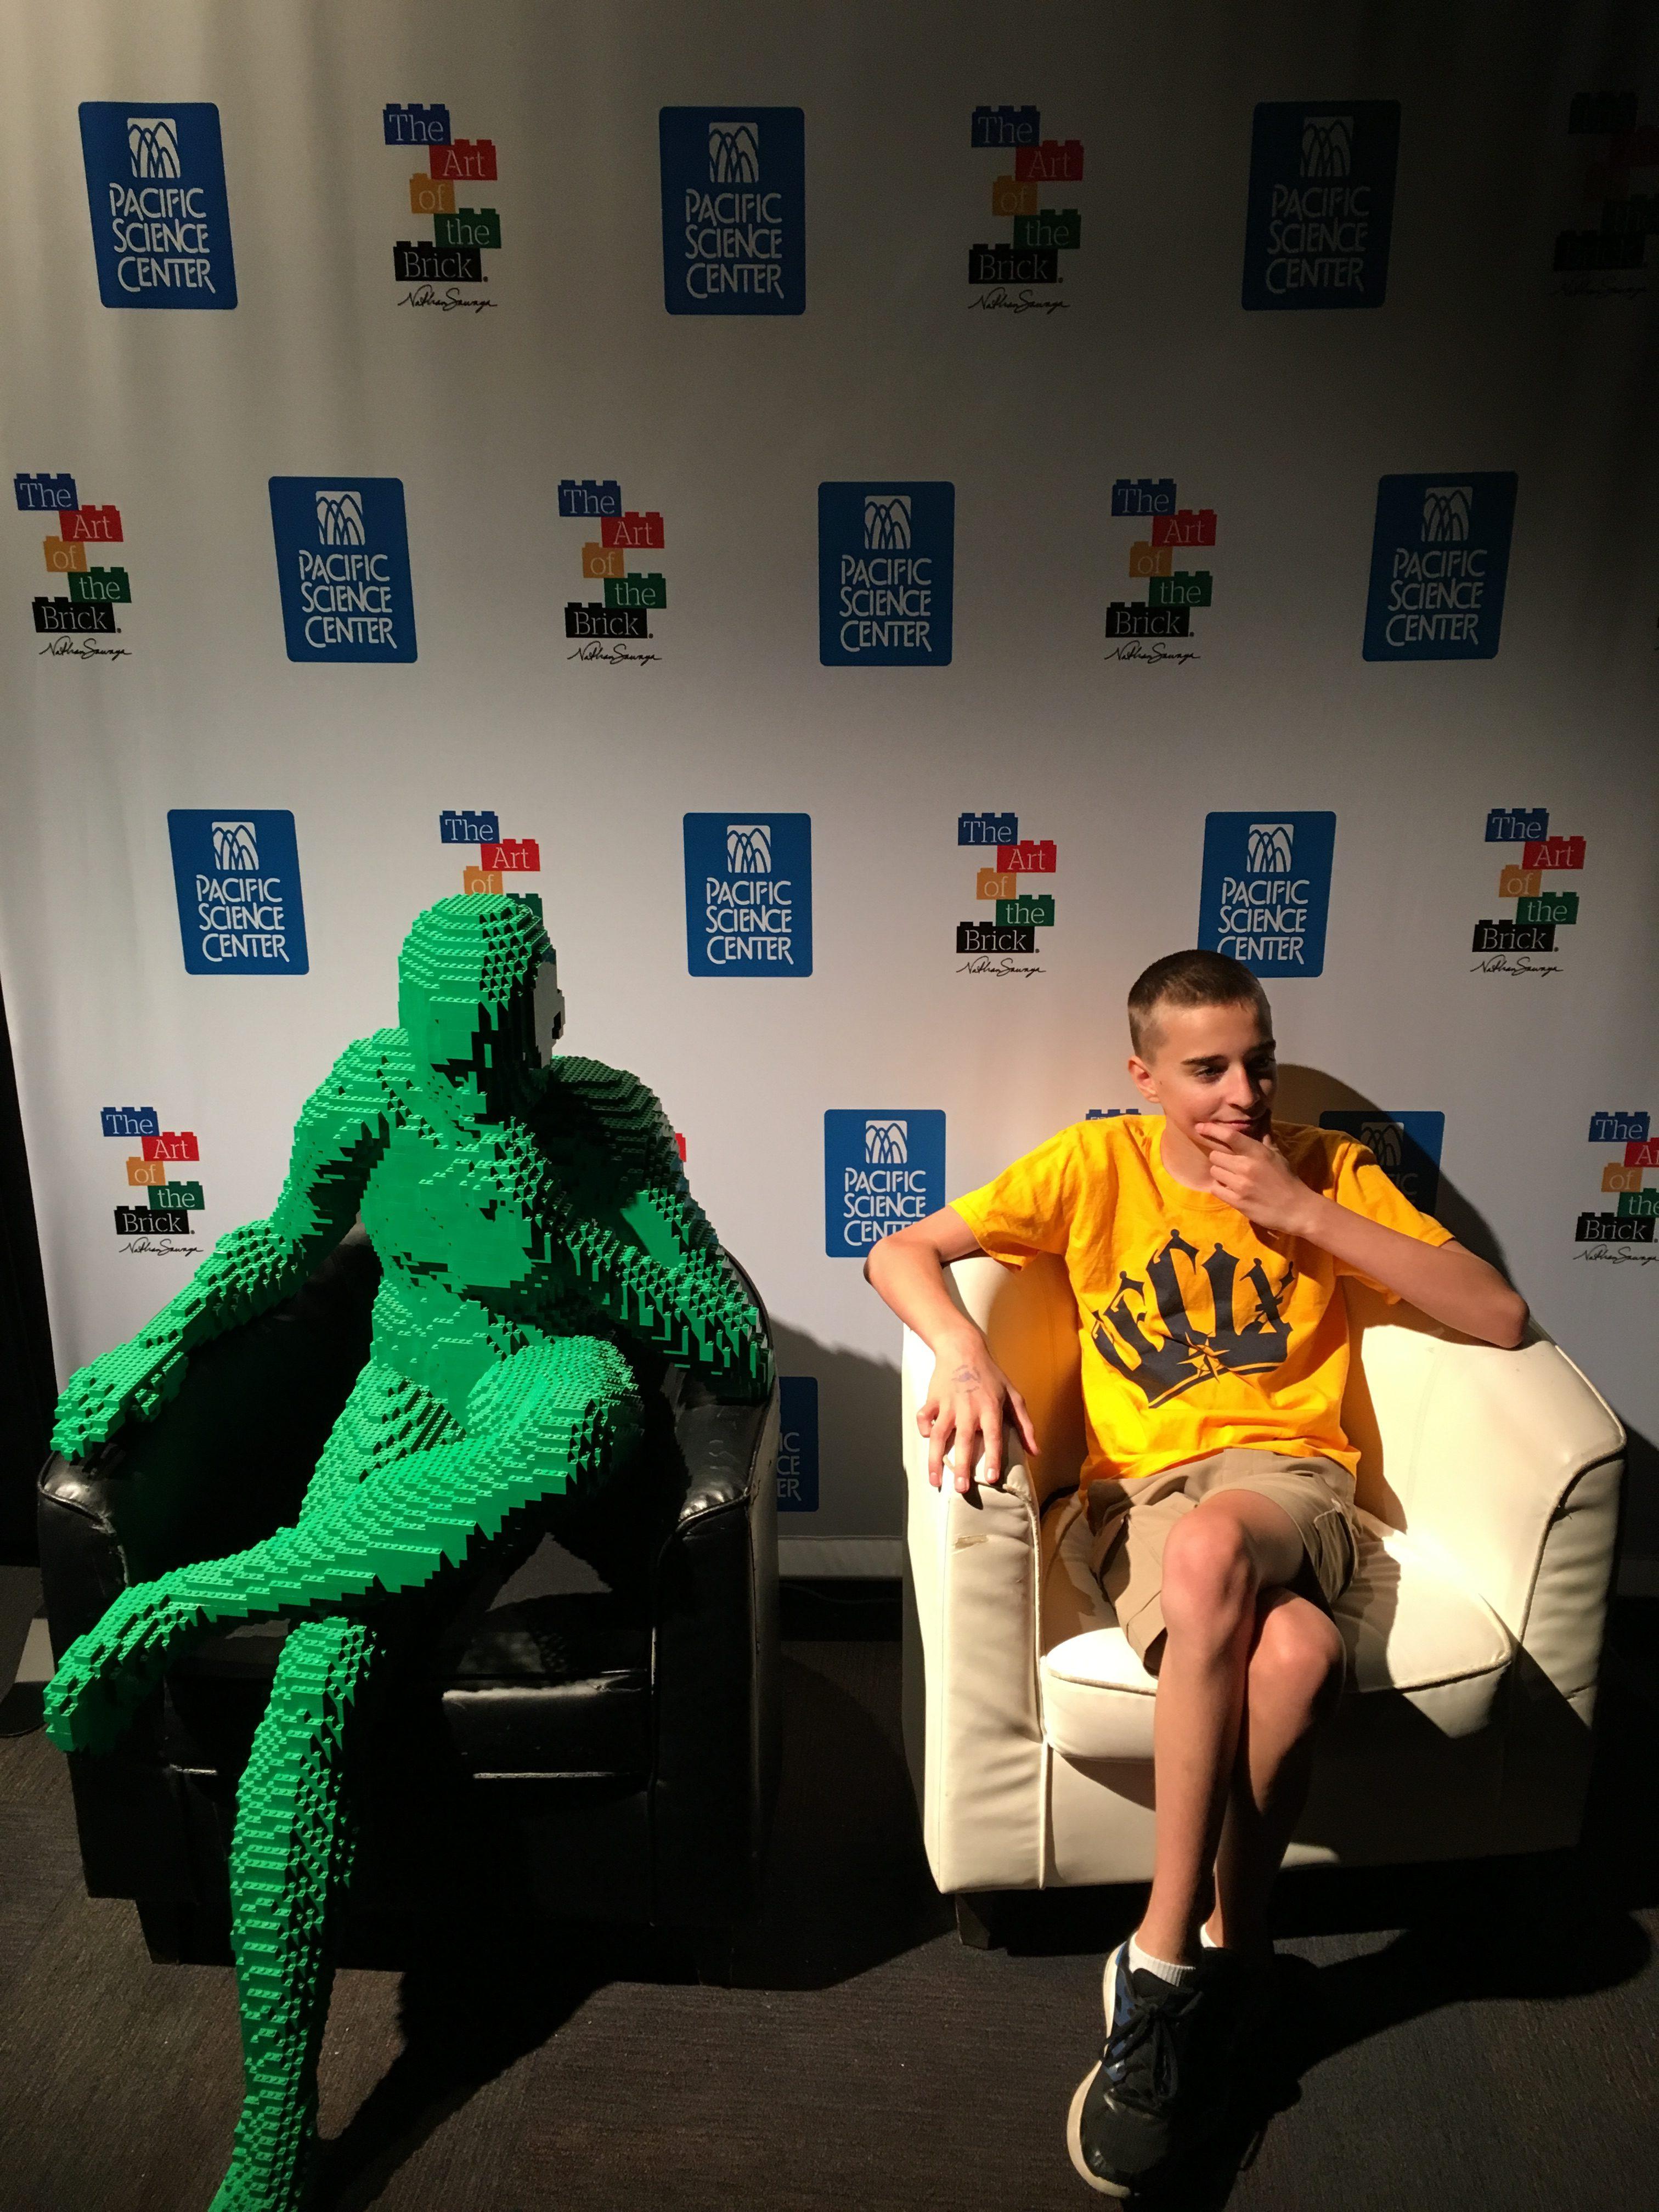 Noah vs. Lego Man